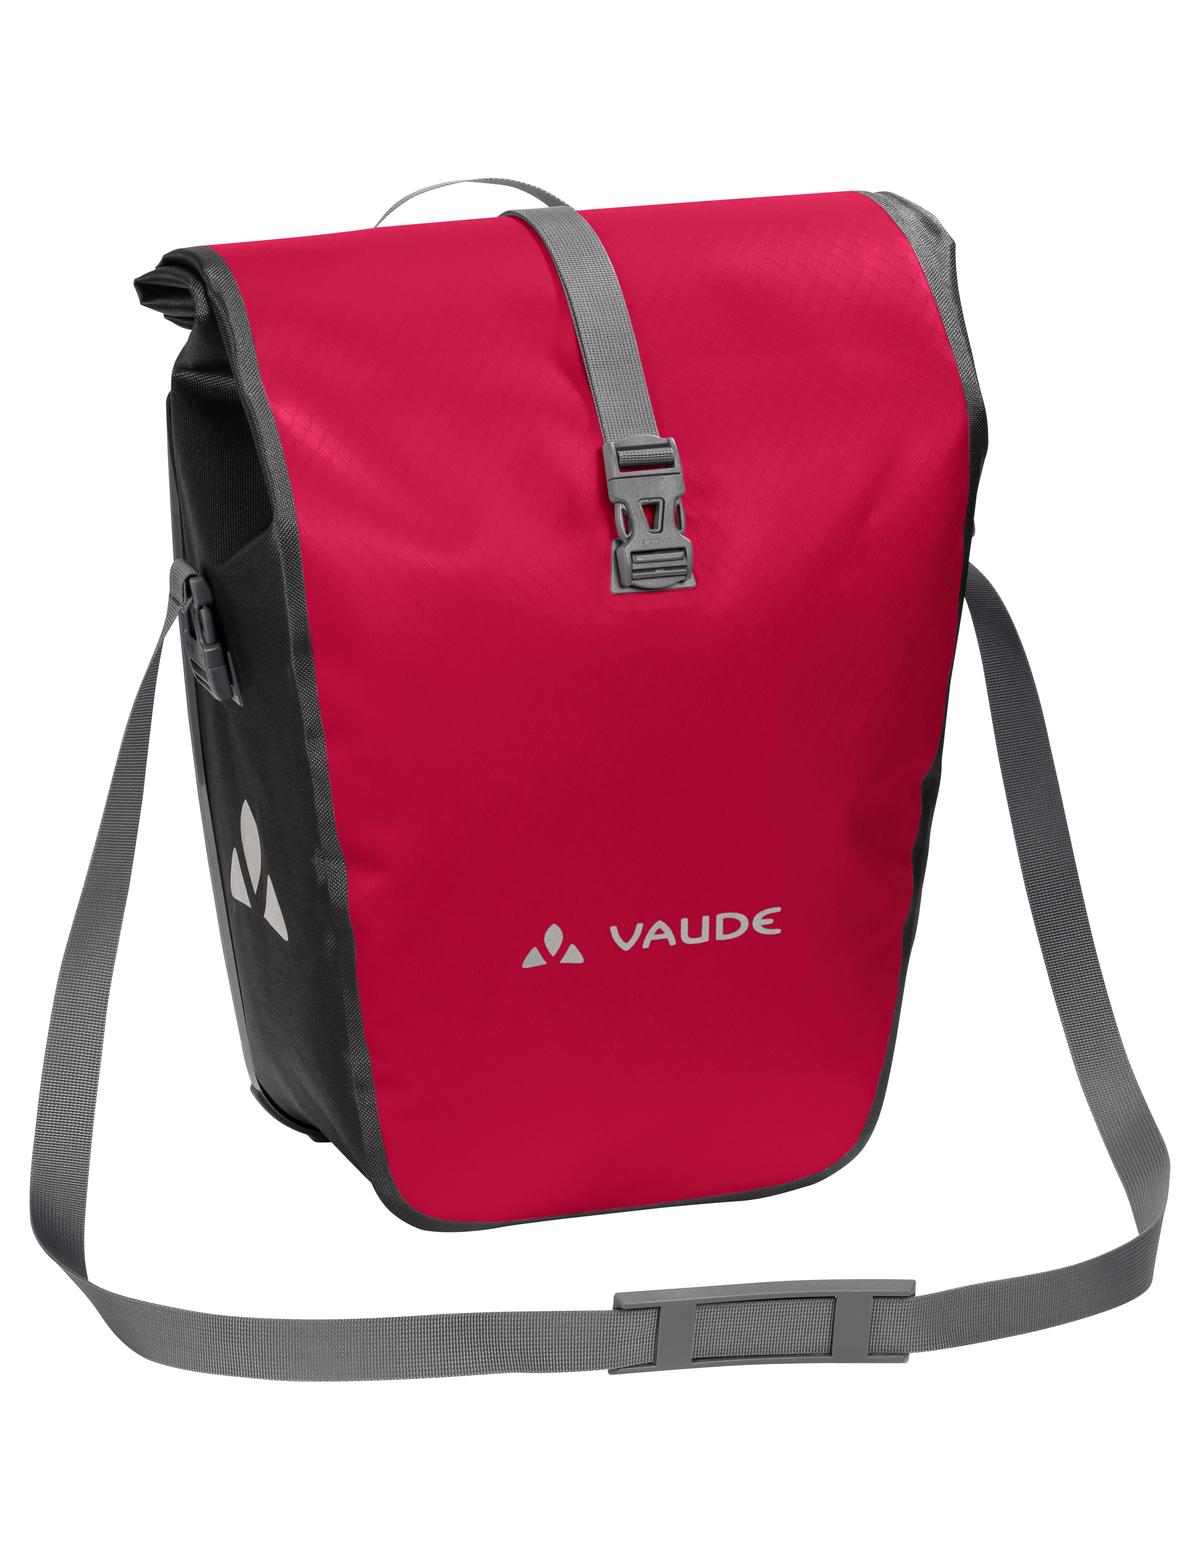 VAUDE Aqua Back Single indian red  - 2-Rad-Sport Wehrle